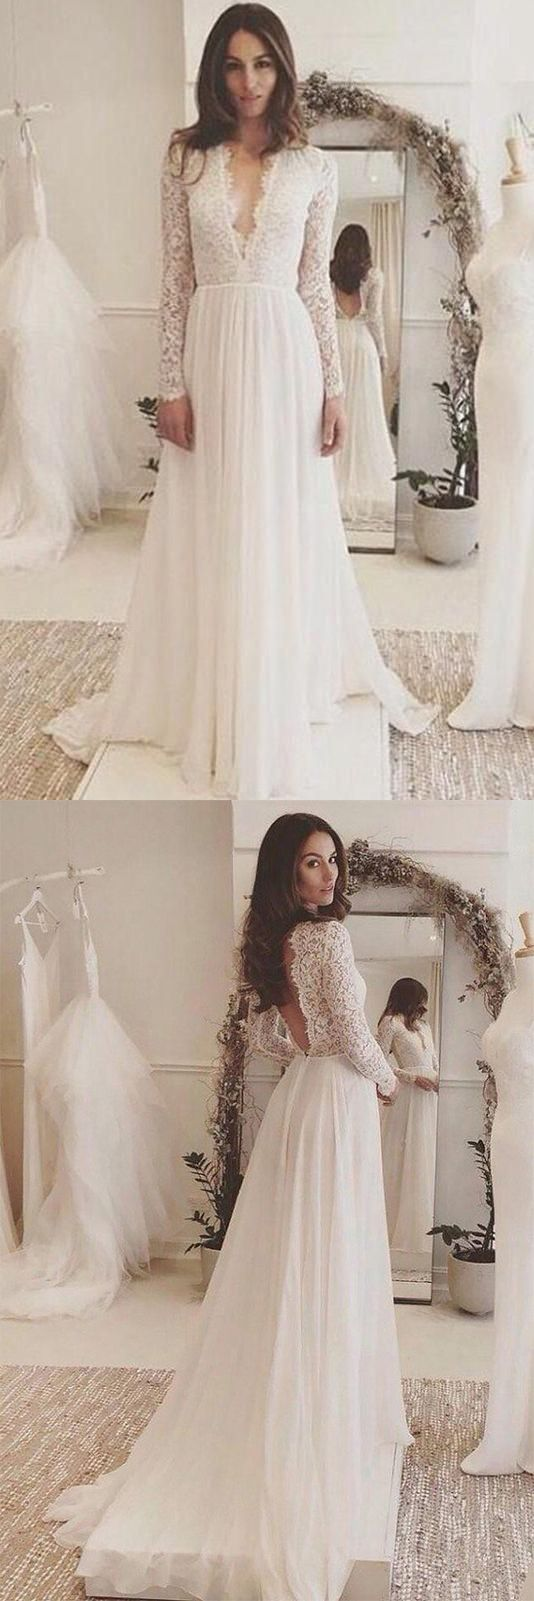 Elegant White Wedding Dress,Chiffon Long Sleeves Bridal Dress,Lace Open Back Wedding Dress from LovePromDresses